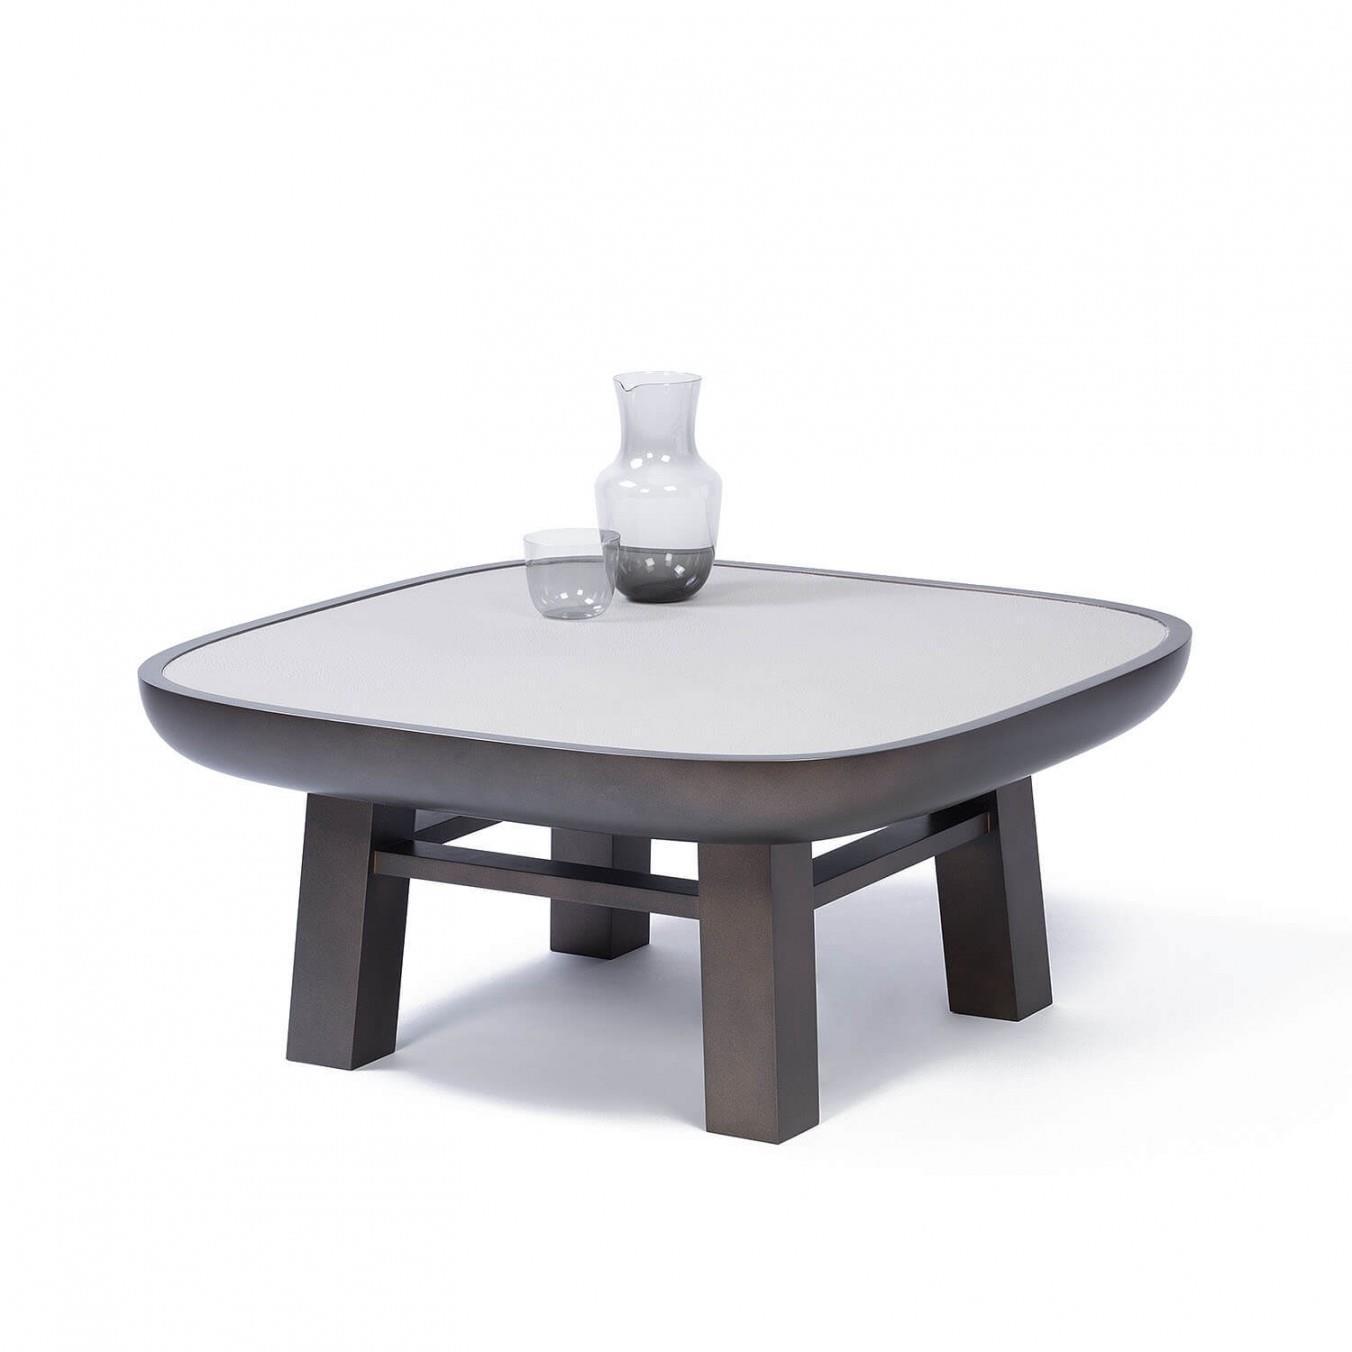 GIOBAGNARA/OLYMPIAセンターテーブル